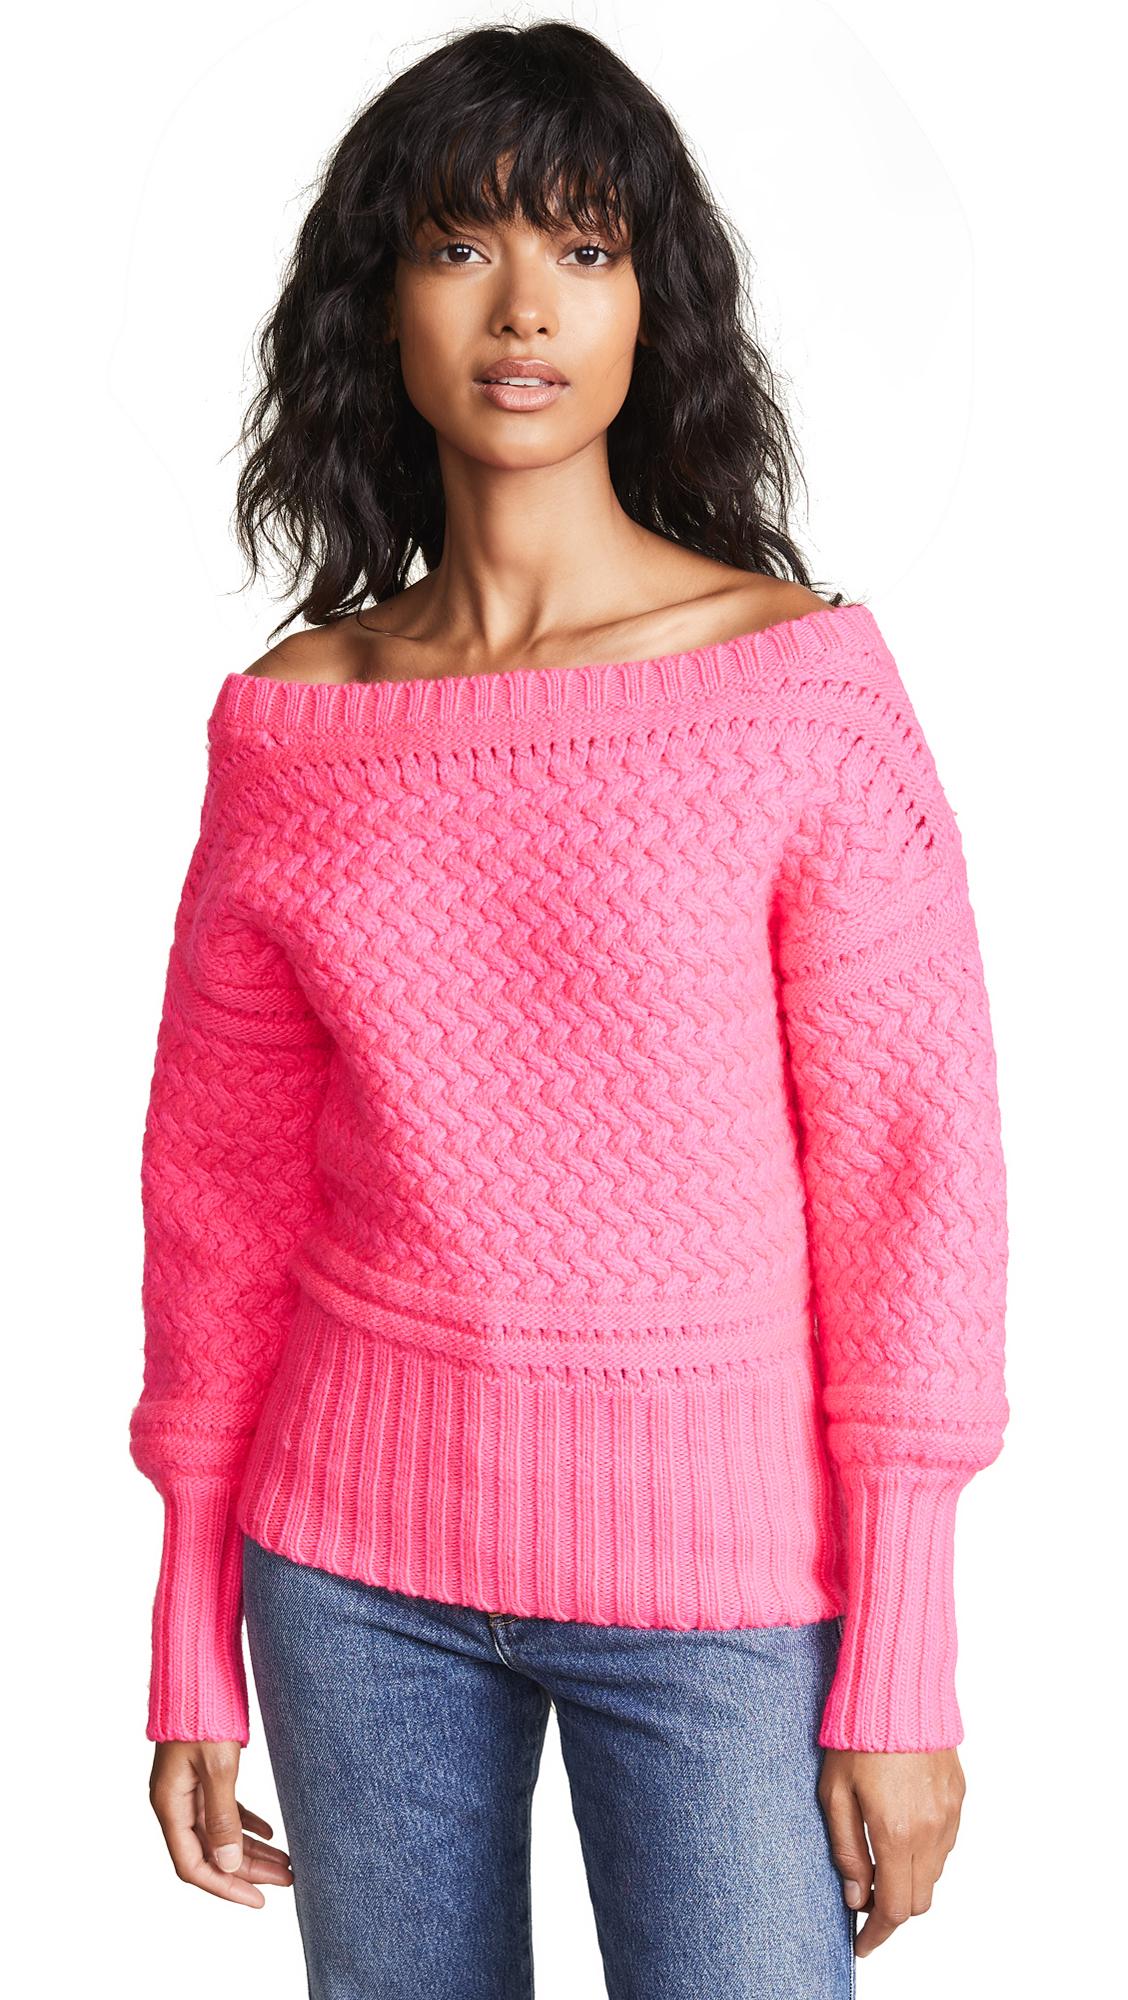 Tanya Taylor Marie Sweater - Hot Pink